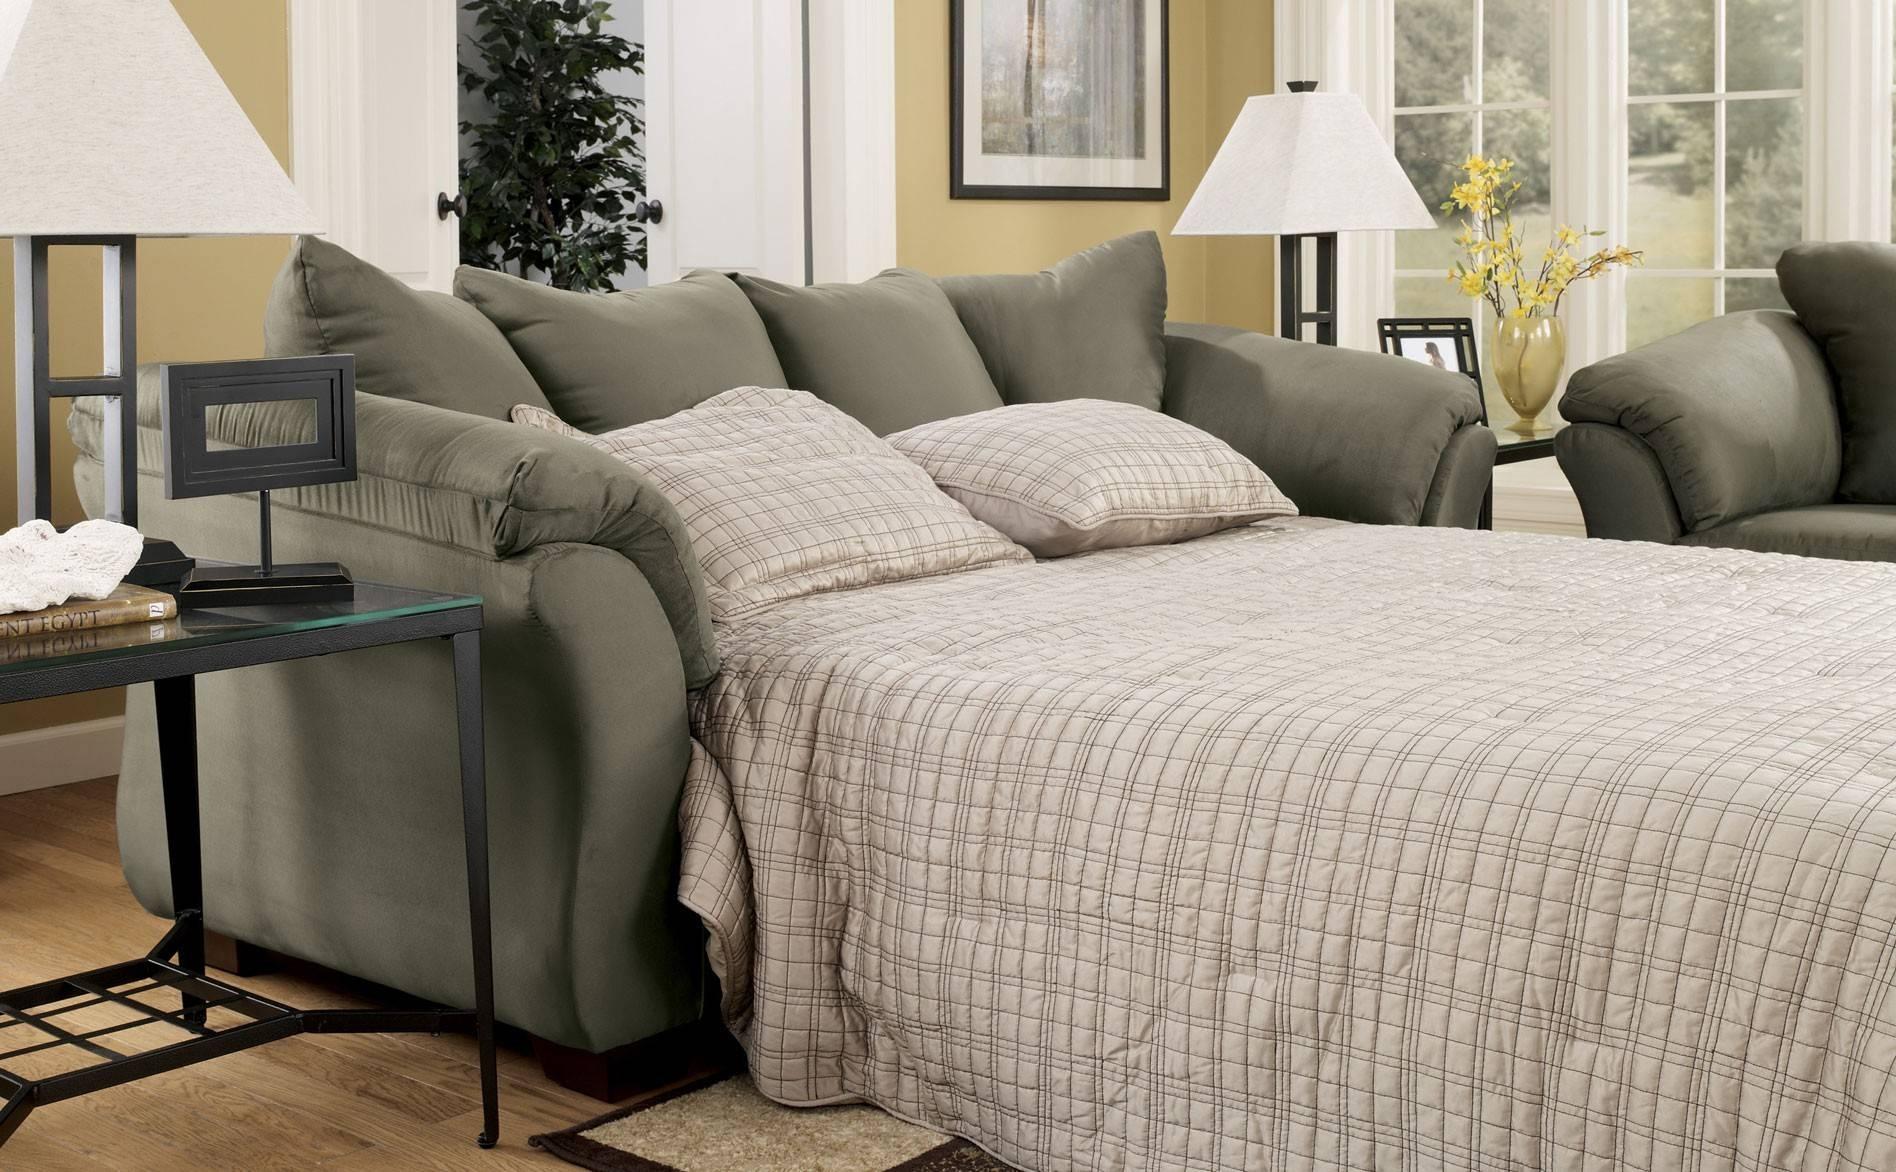 Furniture Home : Sleeper Sofa Big Lots Lp Designs Regarding New With Big Lots Sofa Sleeper (Photo 6 of 30)